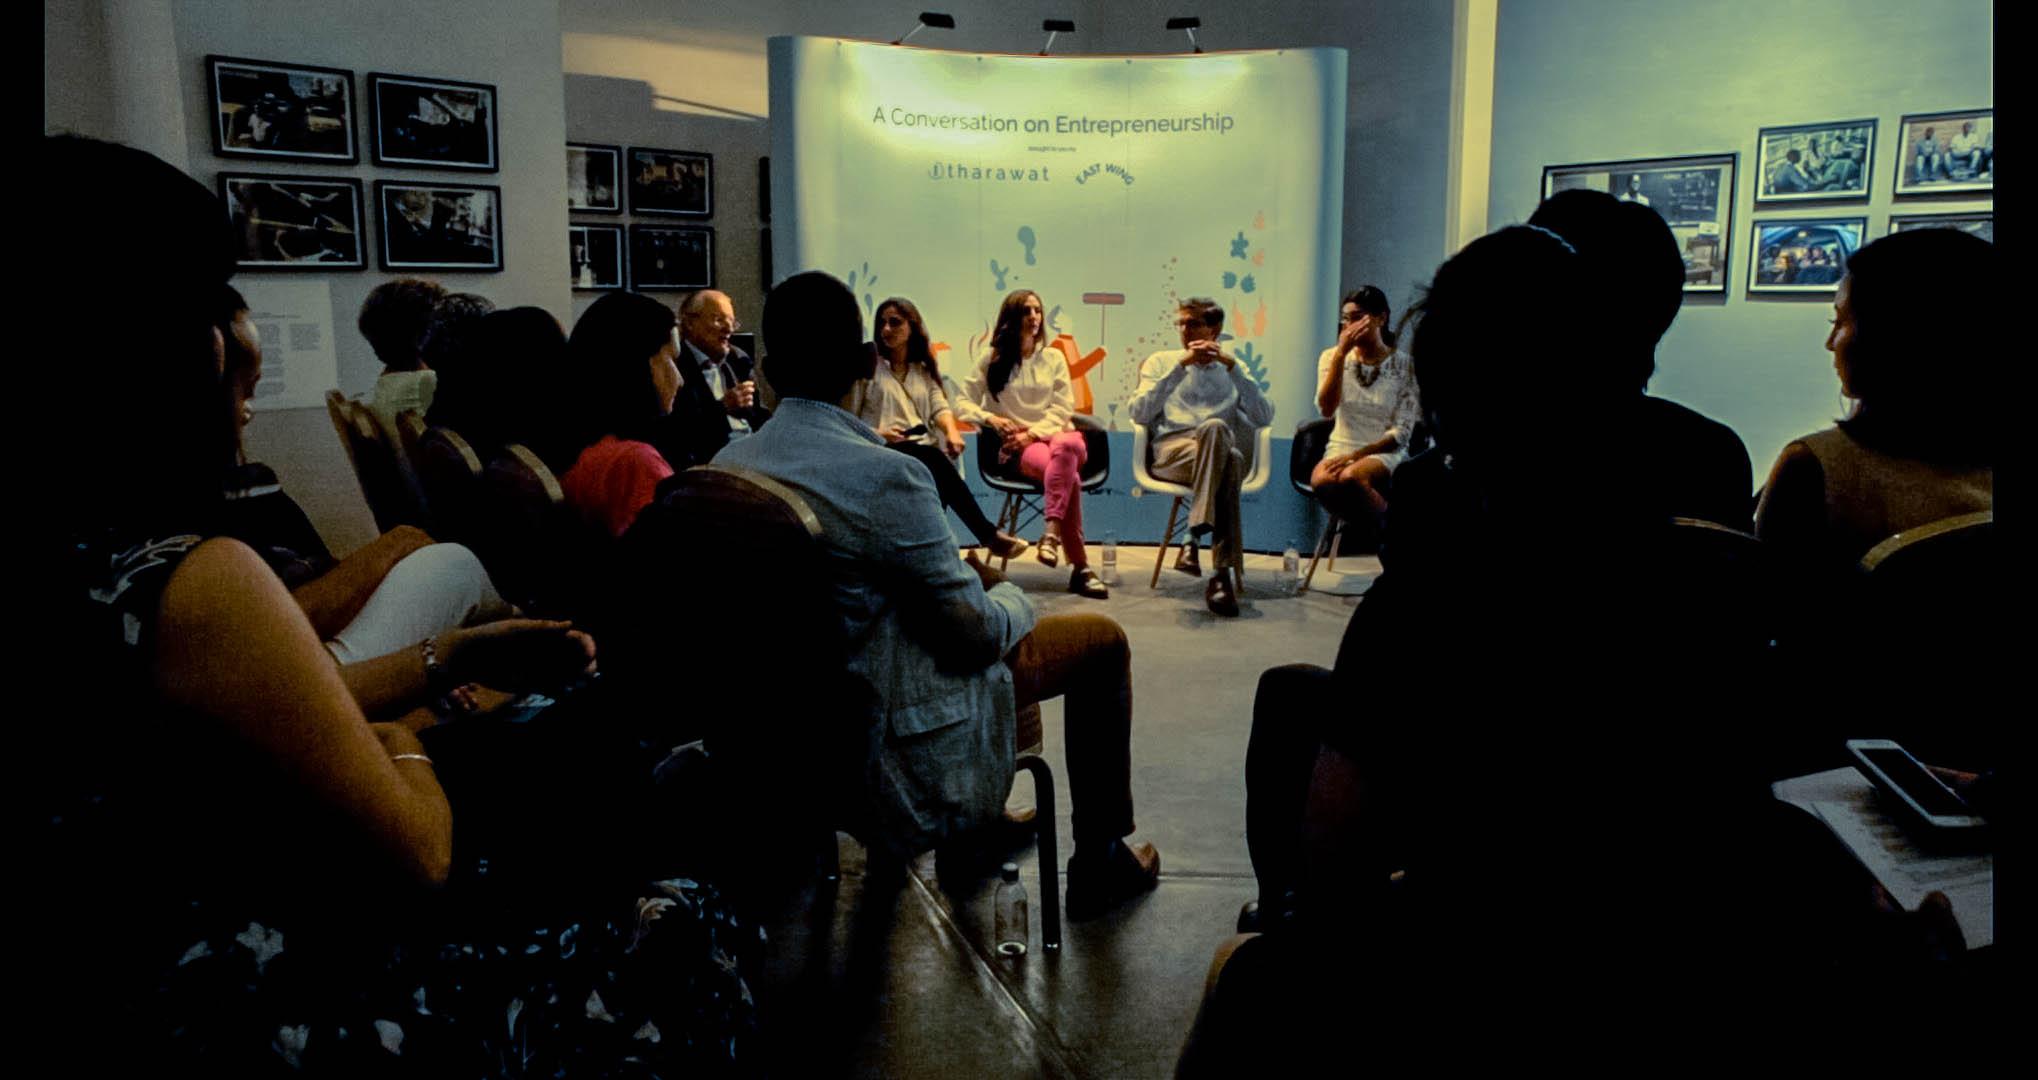 Photo Credit: Conversations in Entrepreneurship, Tharawat Magazine, Dubai. October 2015